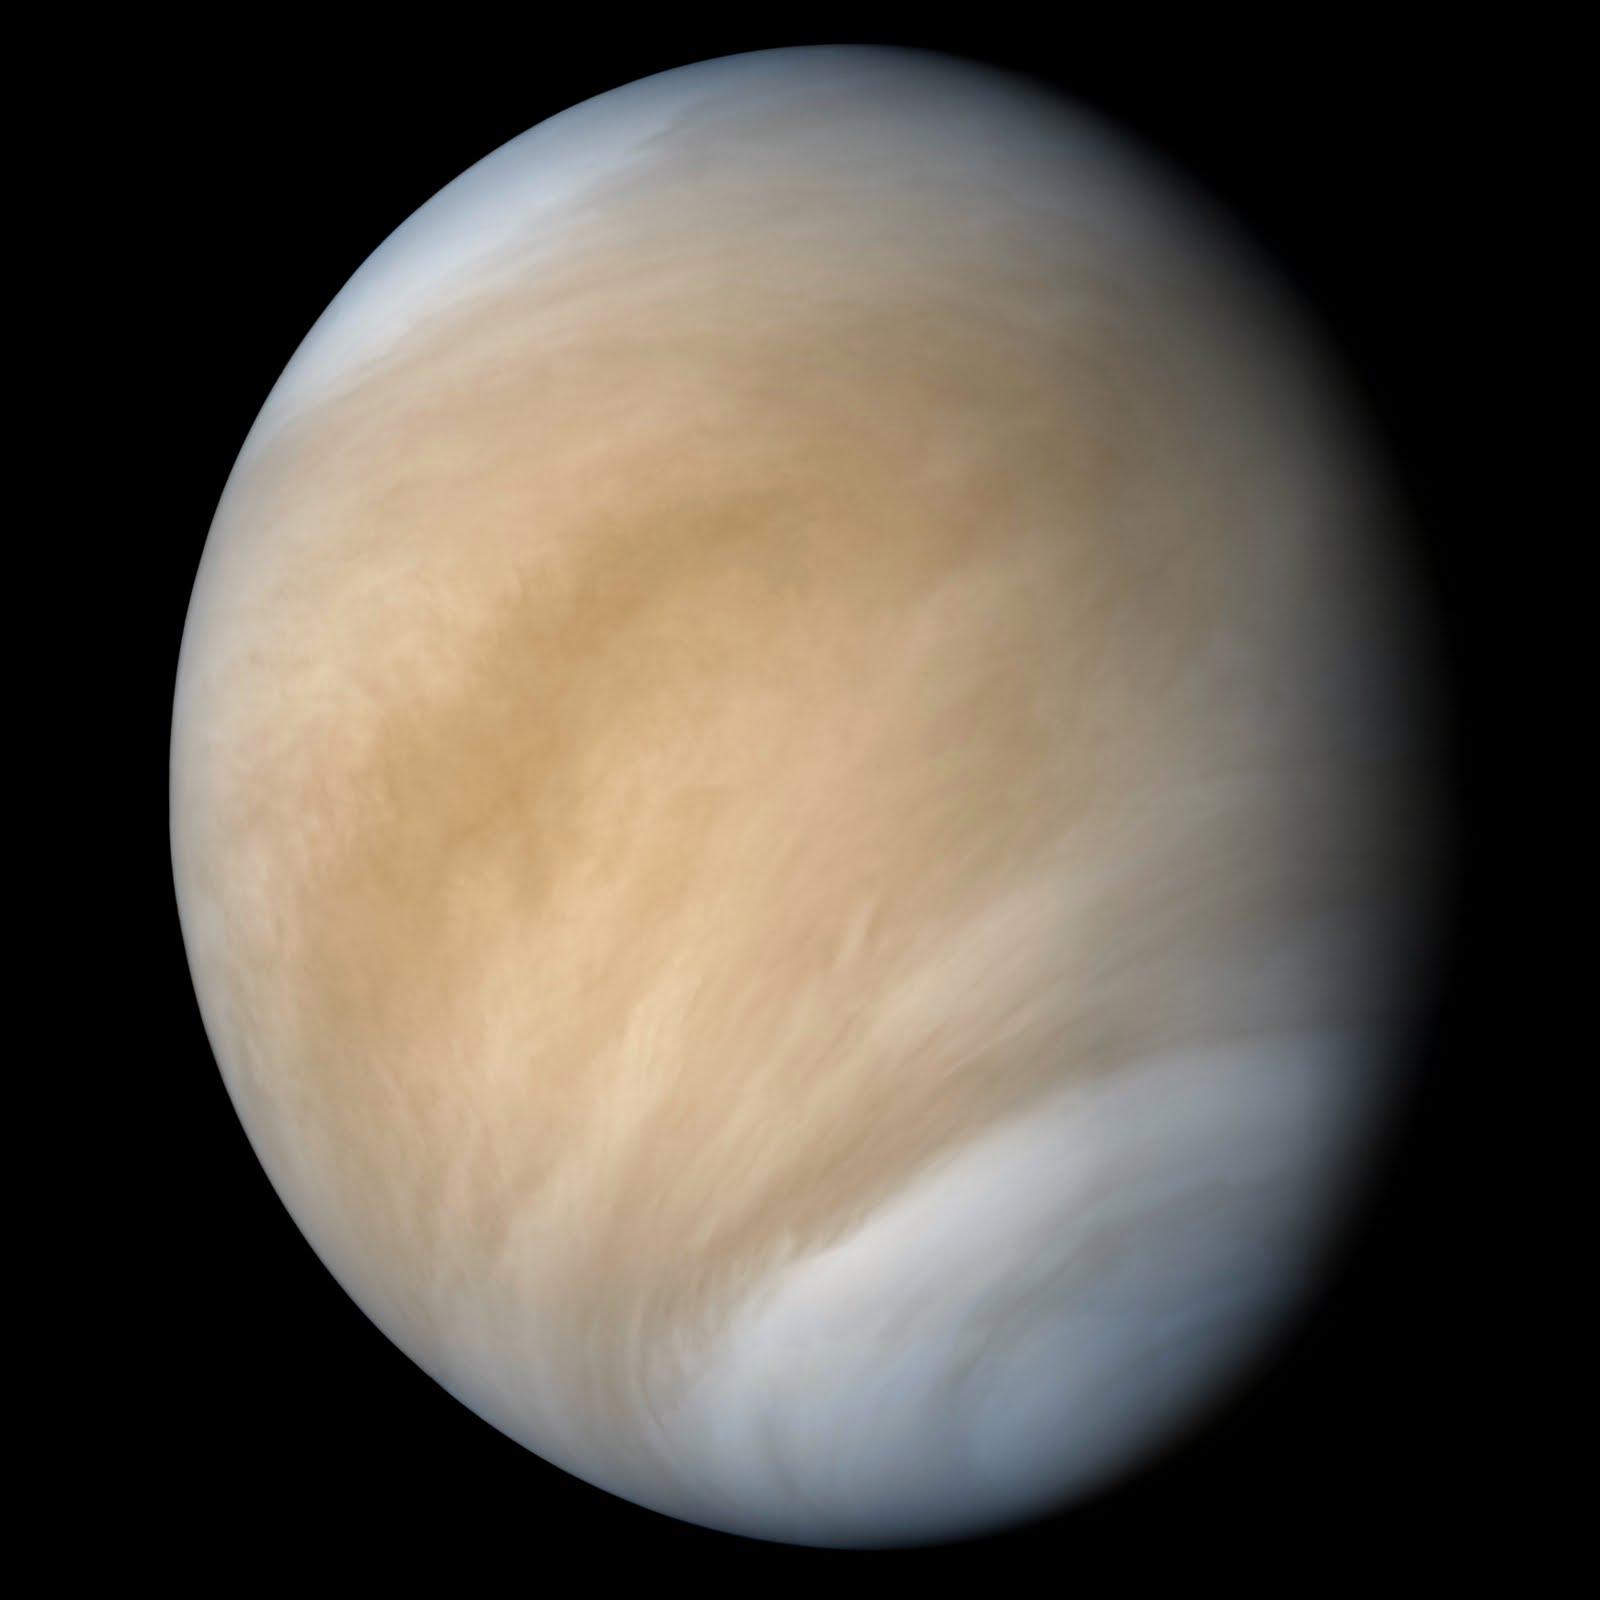 Venus as photographed by the Pioneer spacecraft in 1978. Credit: NASA/JPL/Caltech